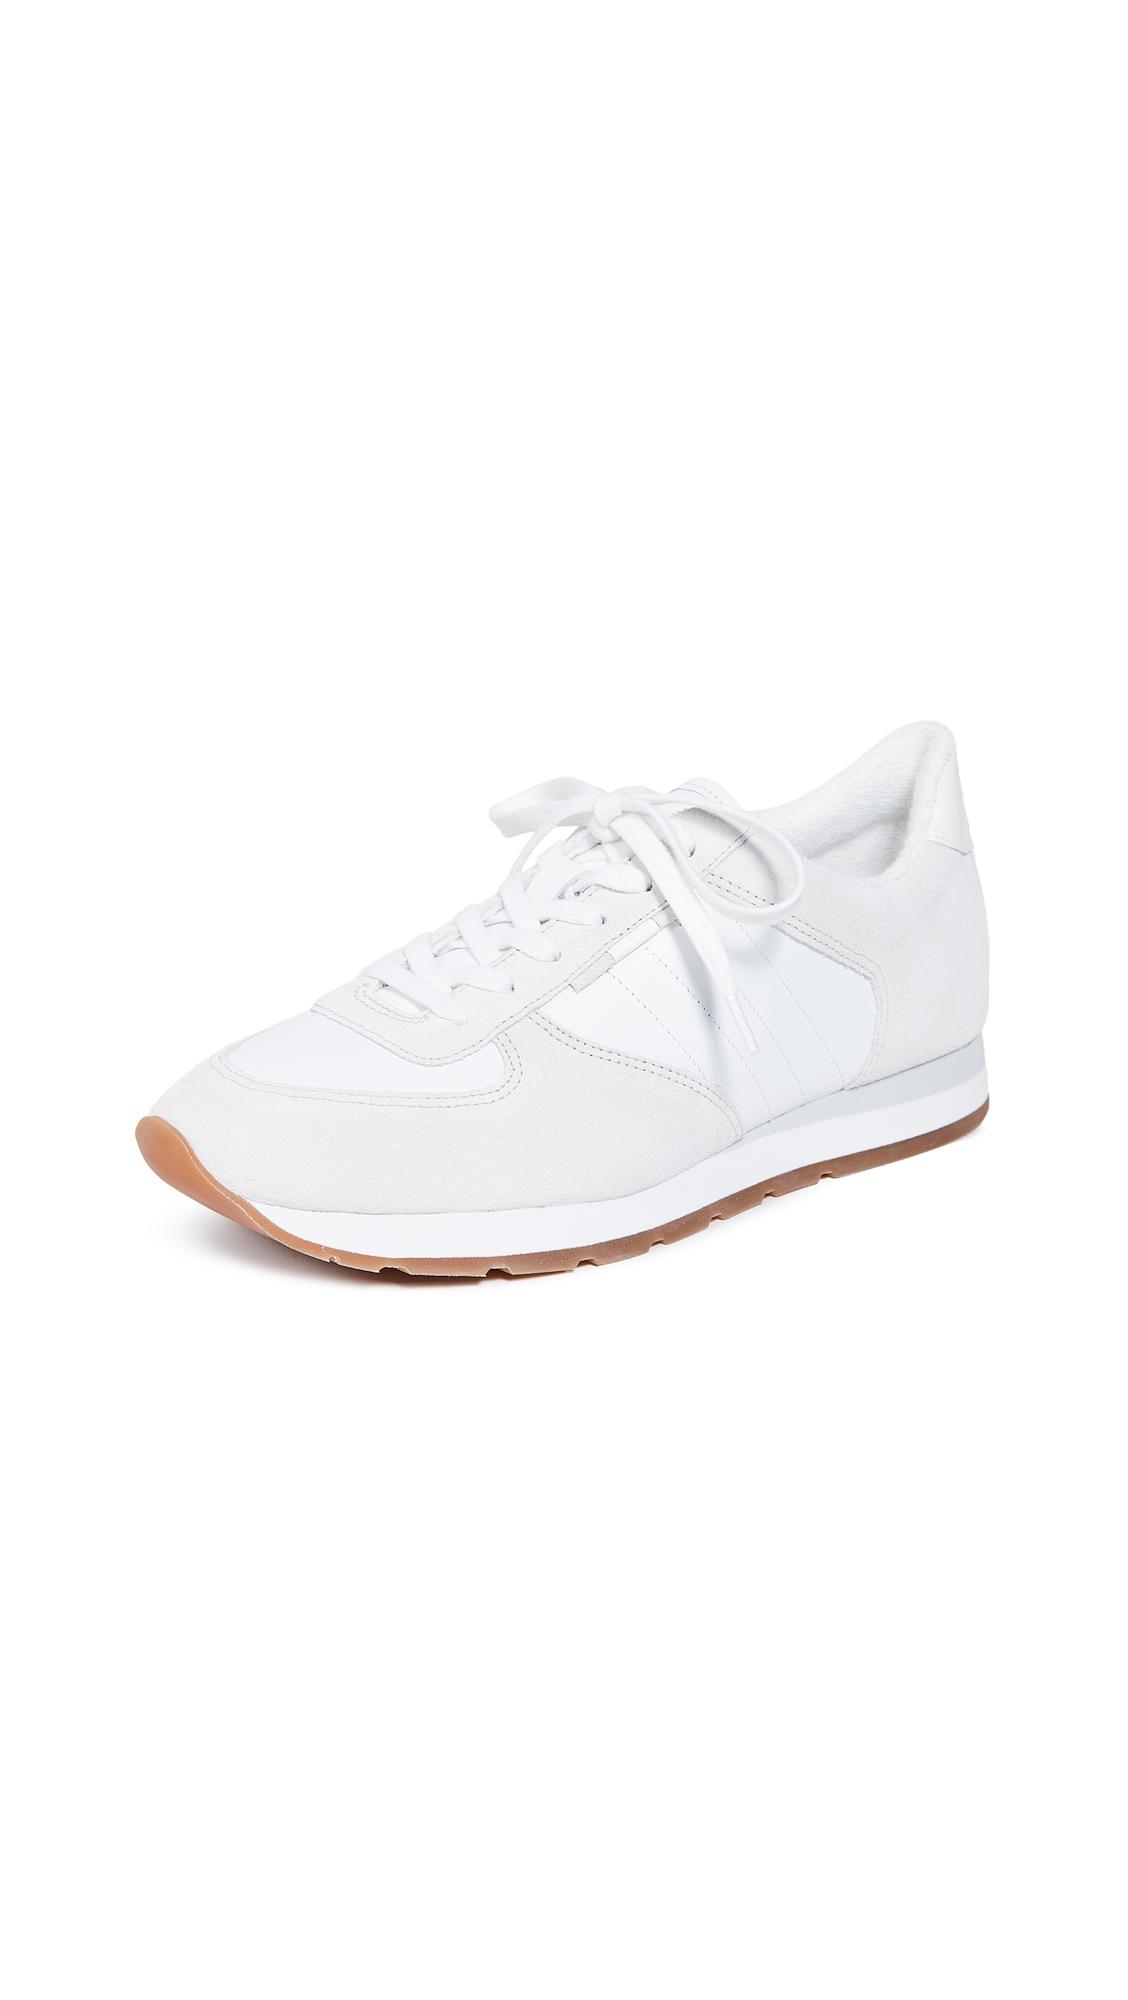 Vince Pasha 2 Sneakers - White